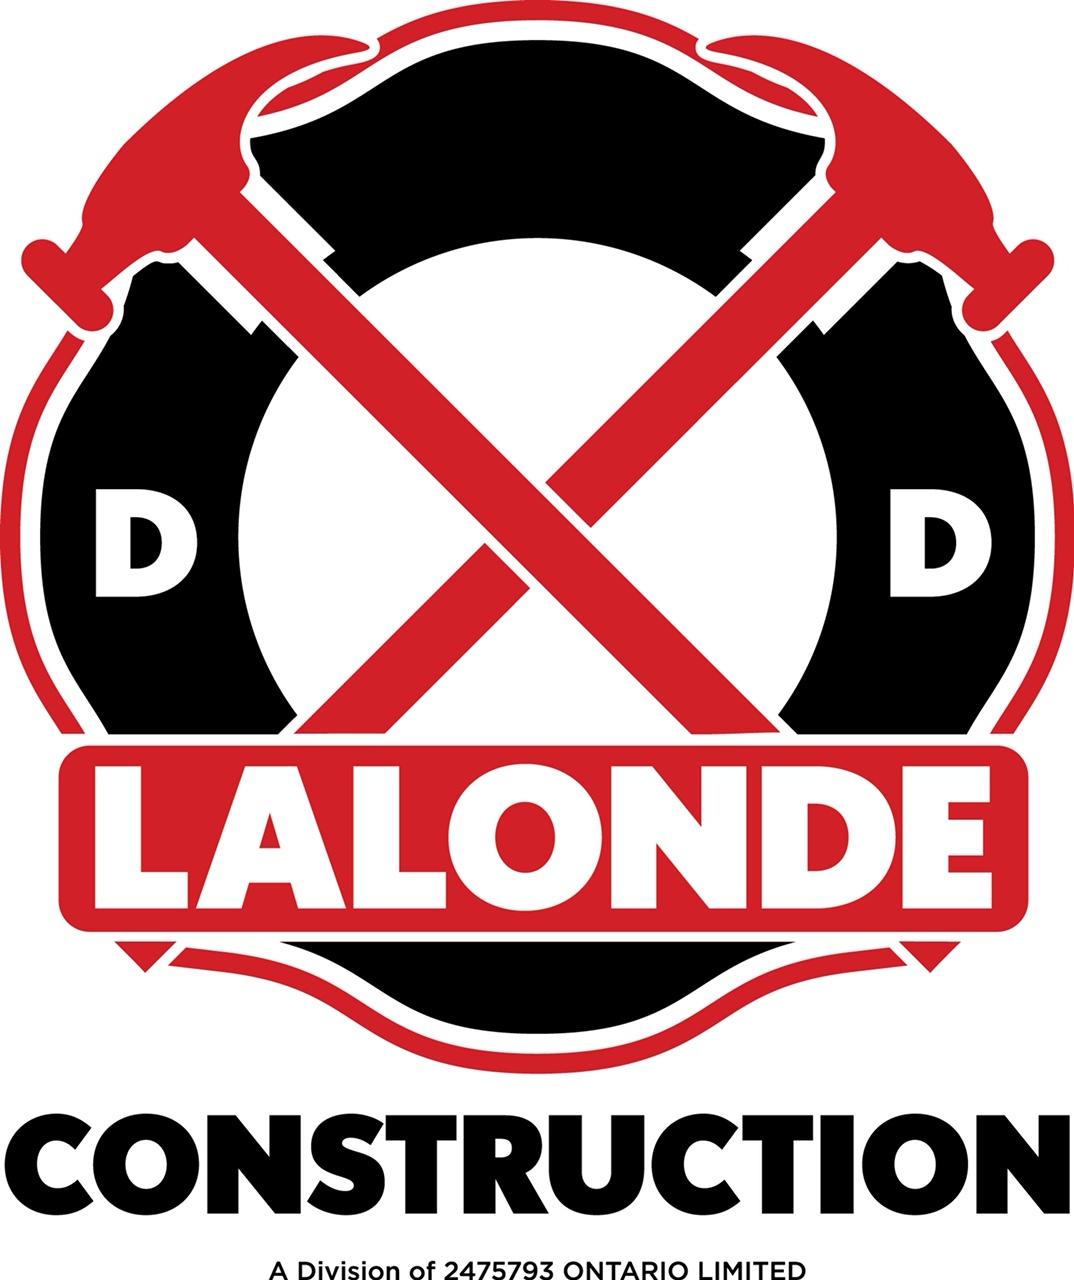 DD-LalondeFINAL-LOGO.jpg